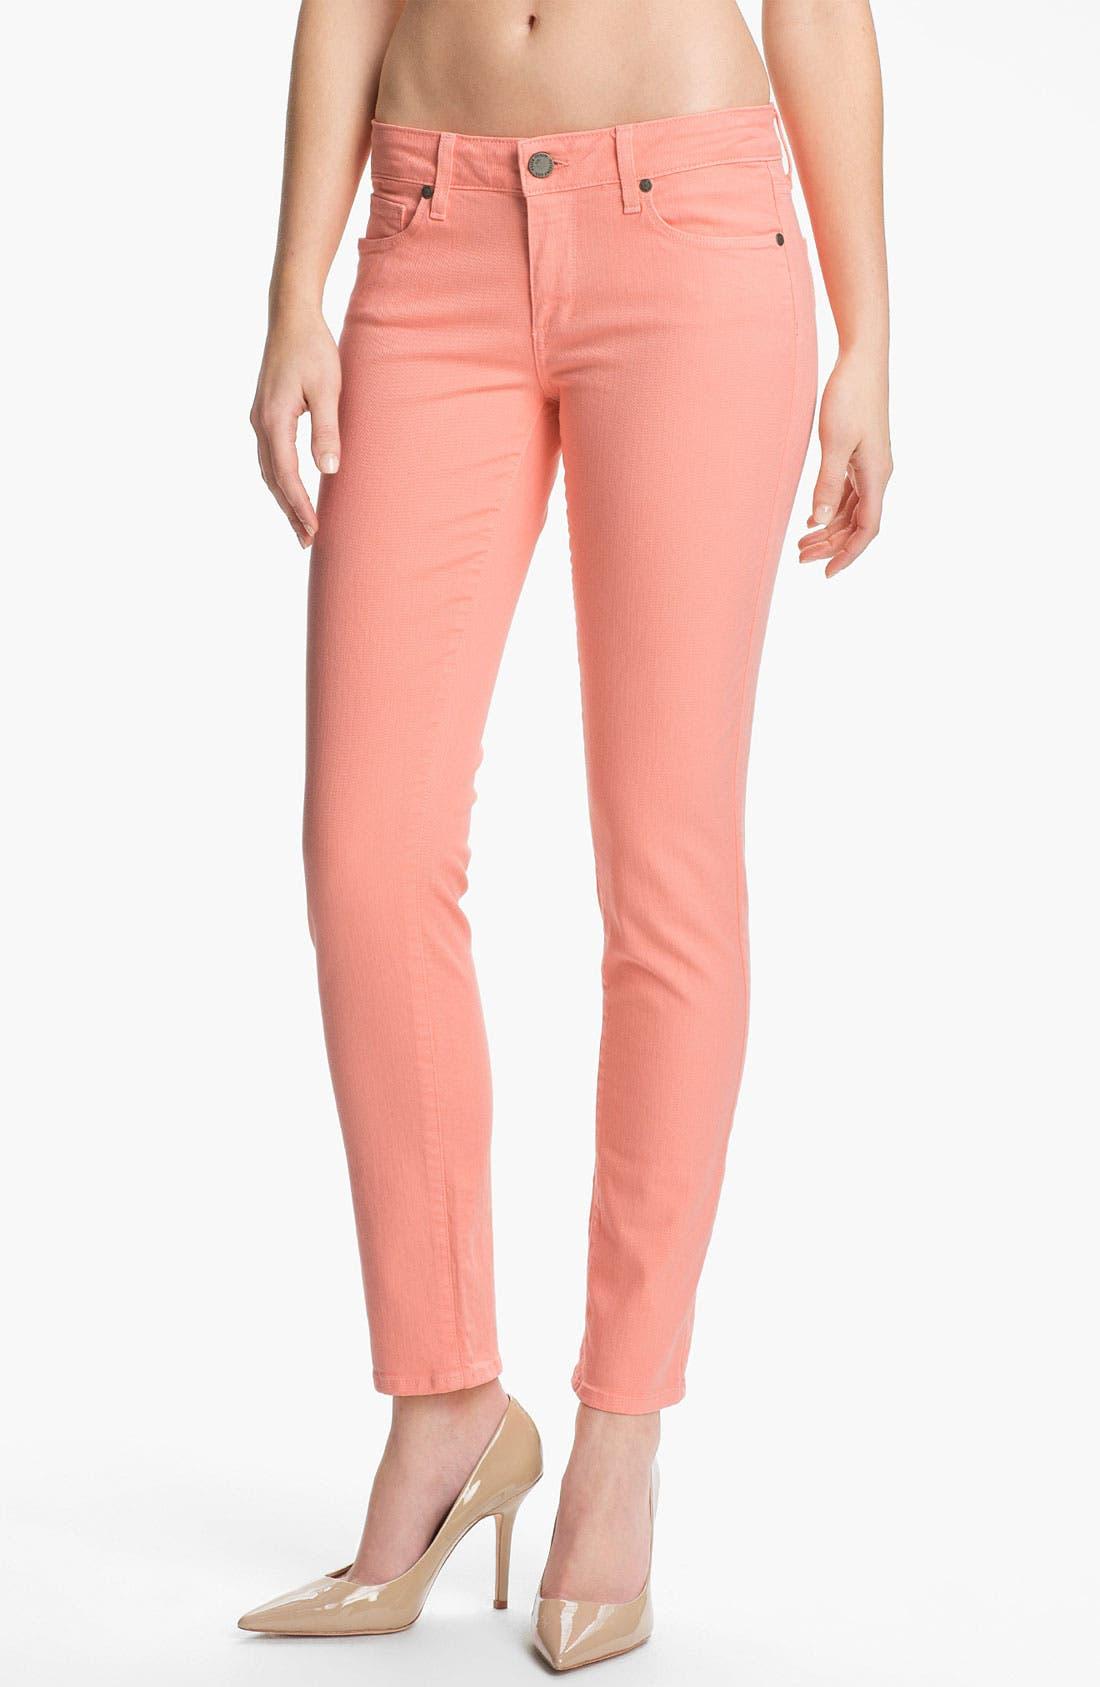 Alternate Image 1 Selected - Paige Denim 'Skyline' Skinny Stretch Ankle Jeans (Flamingo)